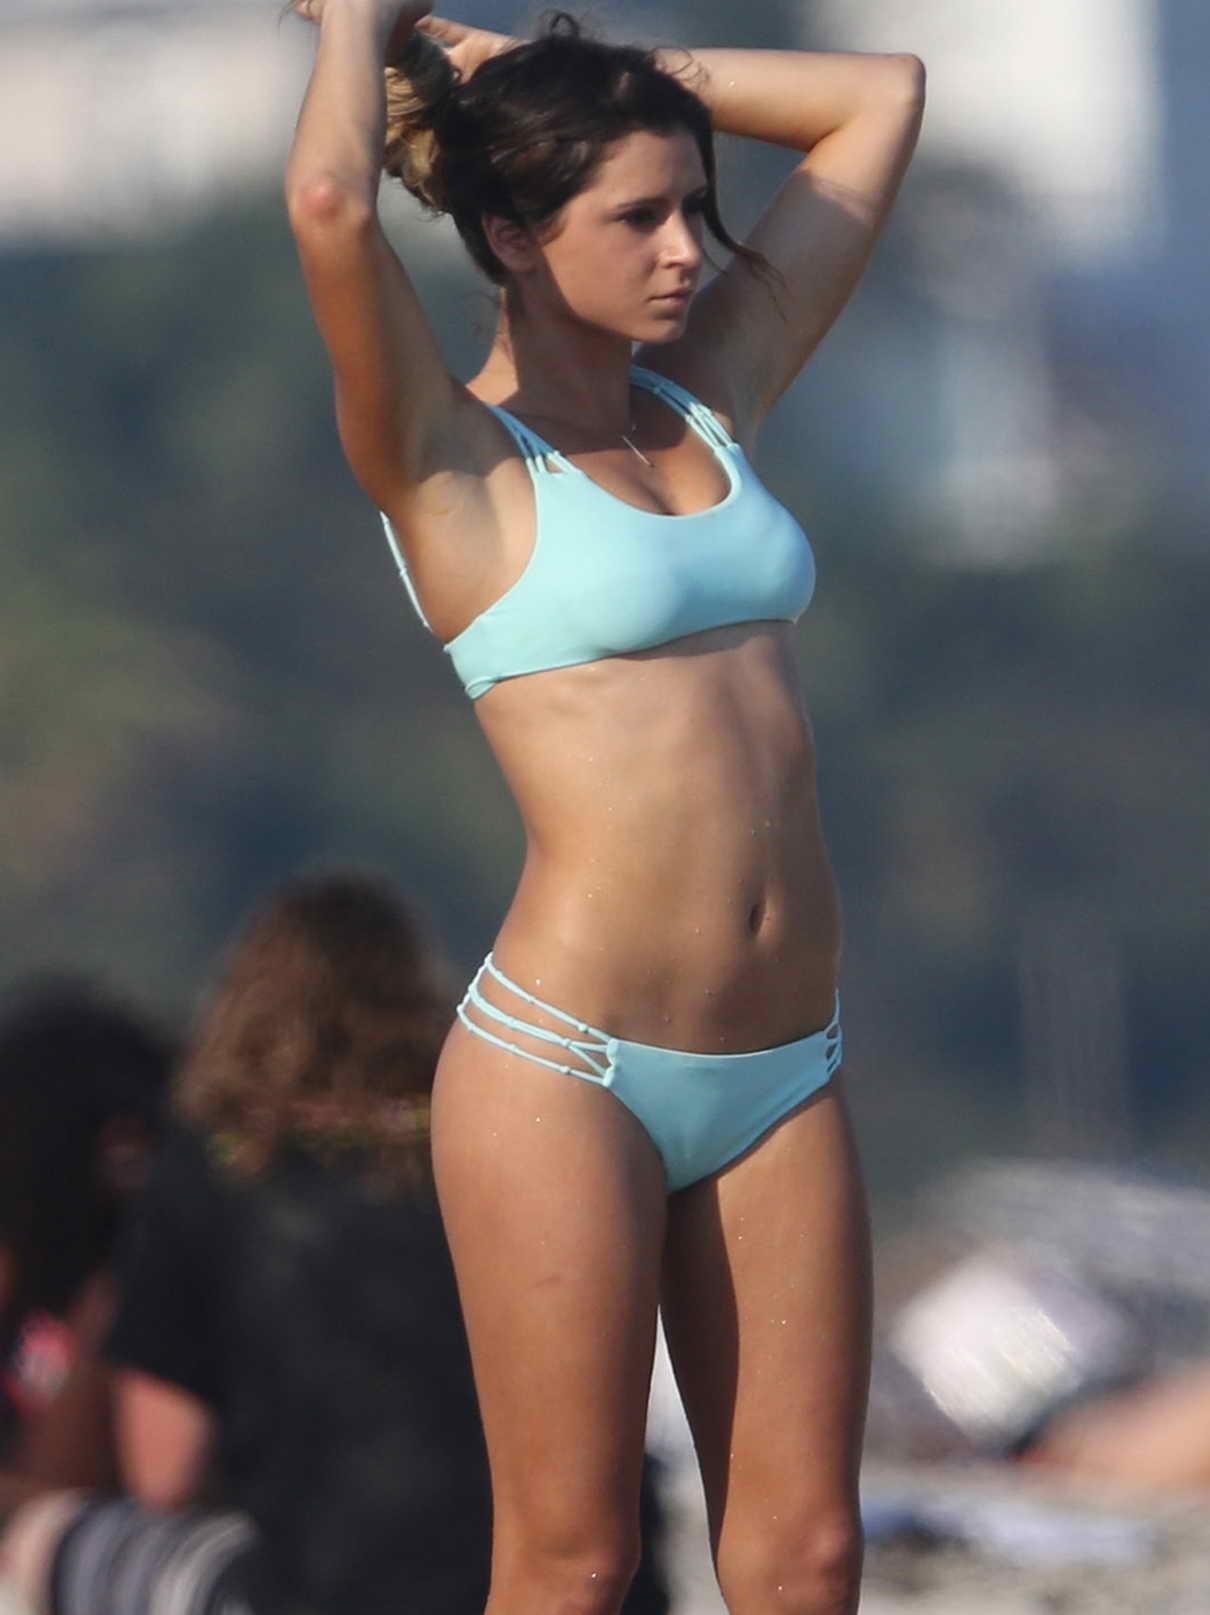 anastasia ashley in bikini at the beach in miami lacelebs co